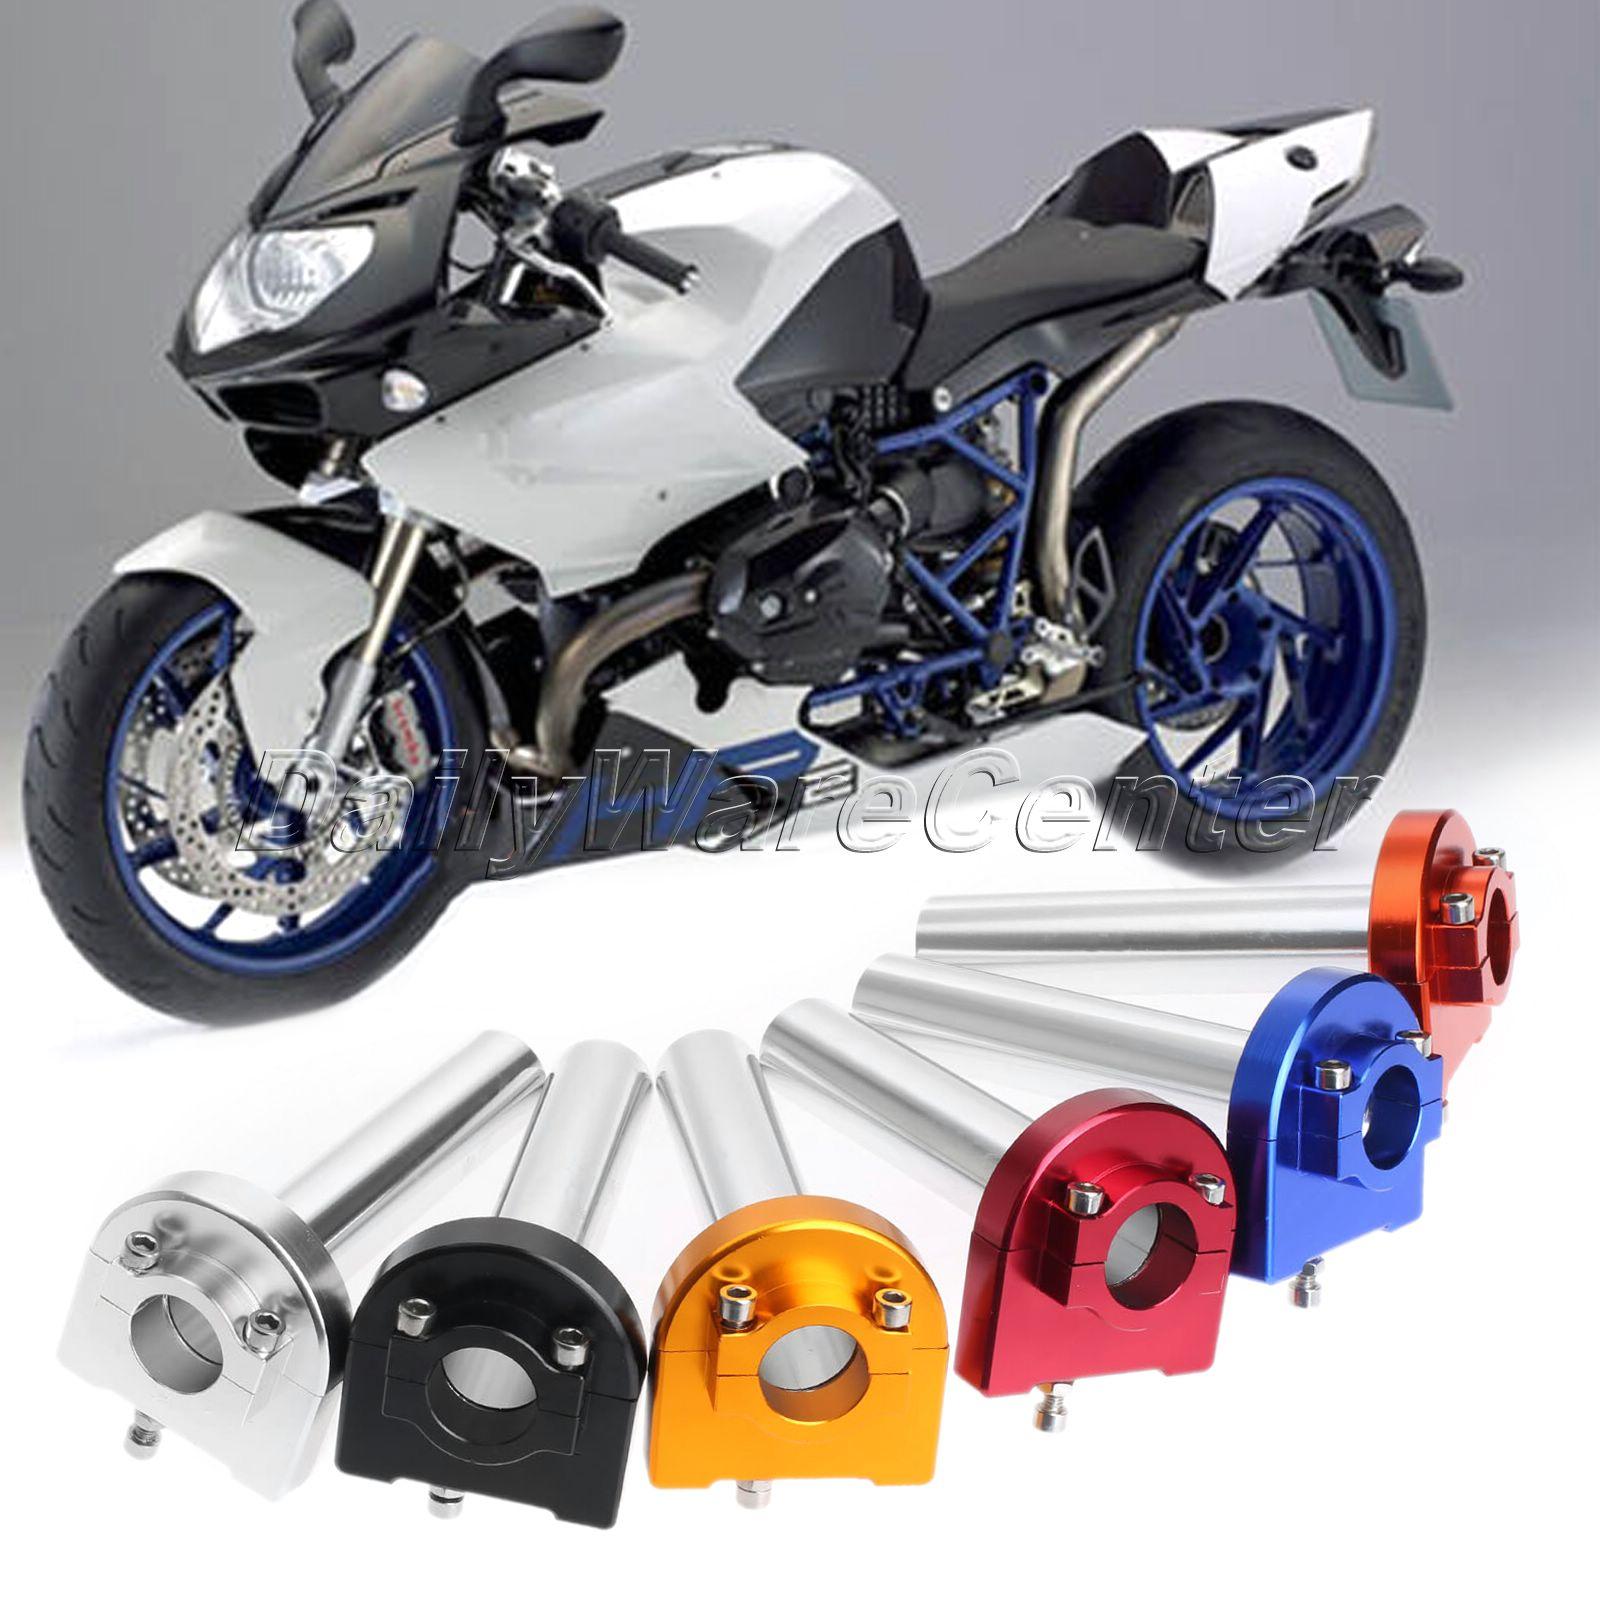 "Universal CNC Aluminum 7/8"" 22mm Hand Grips Handlebar Throttle Tube Lever Control for HONDA SPORT Motocross DIRT BIKE SCOOTERS(China (Mainland))"